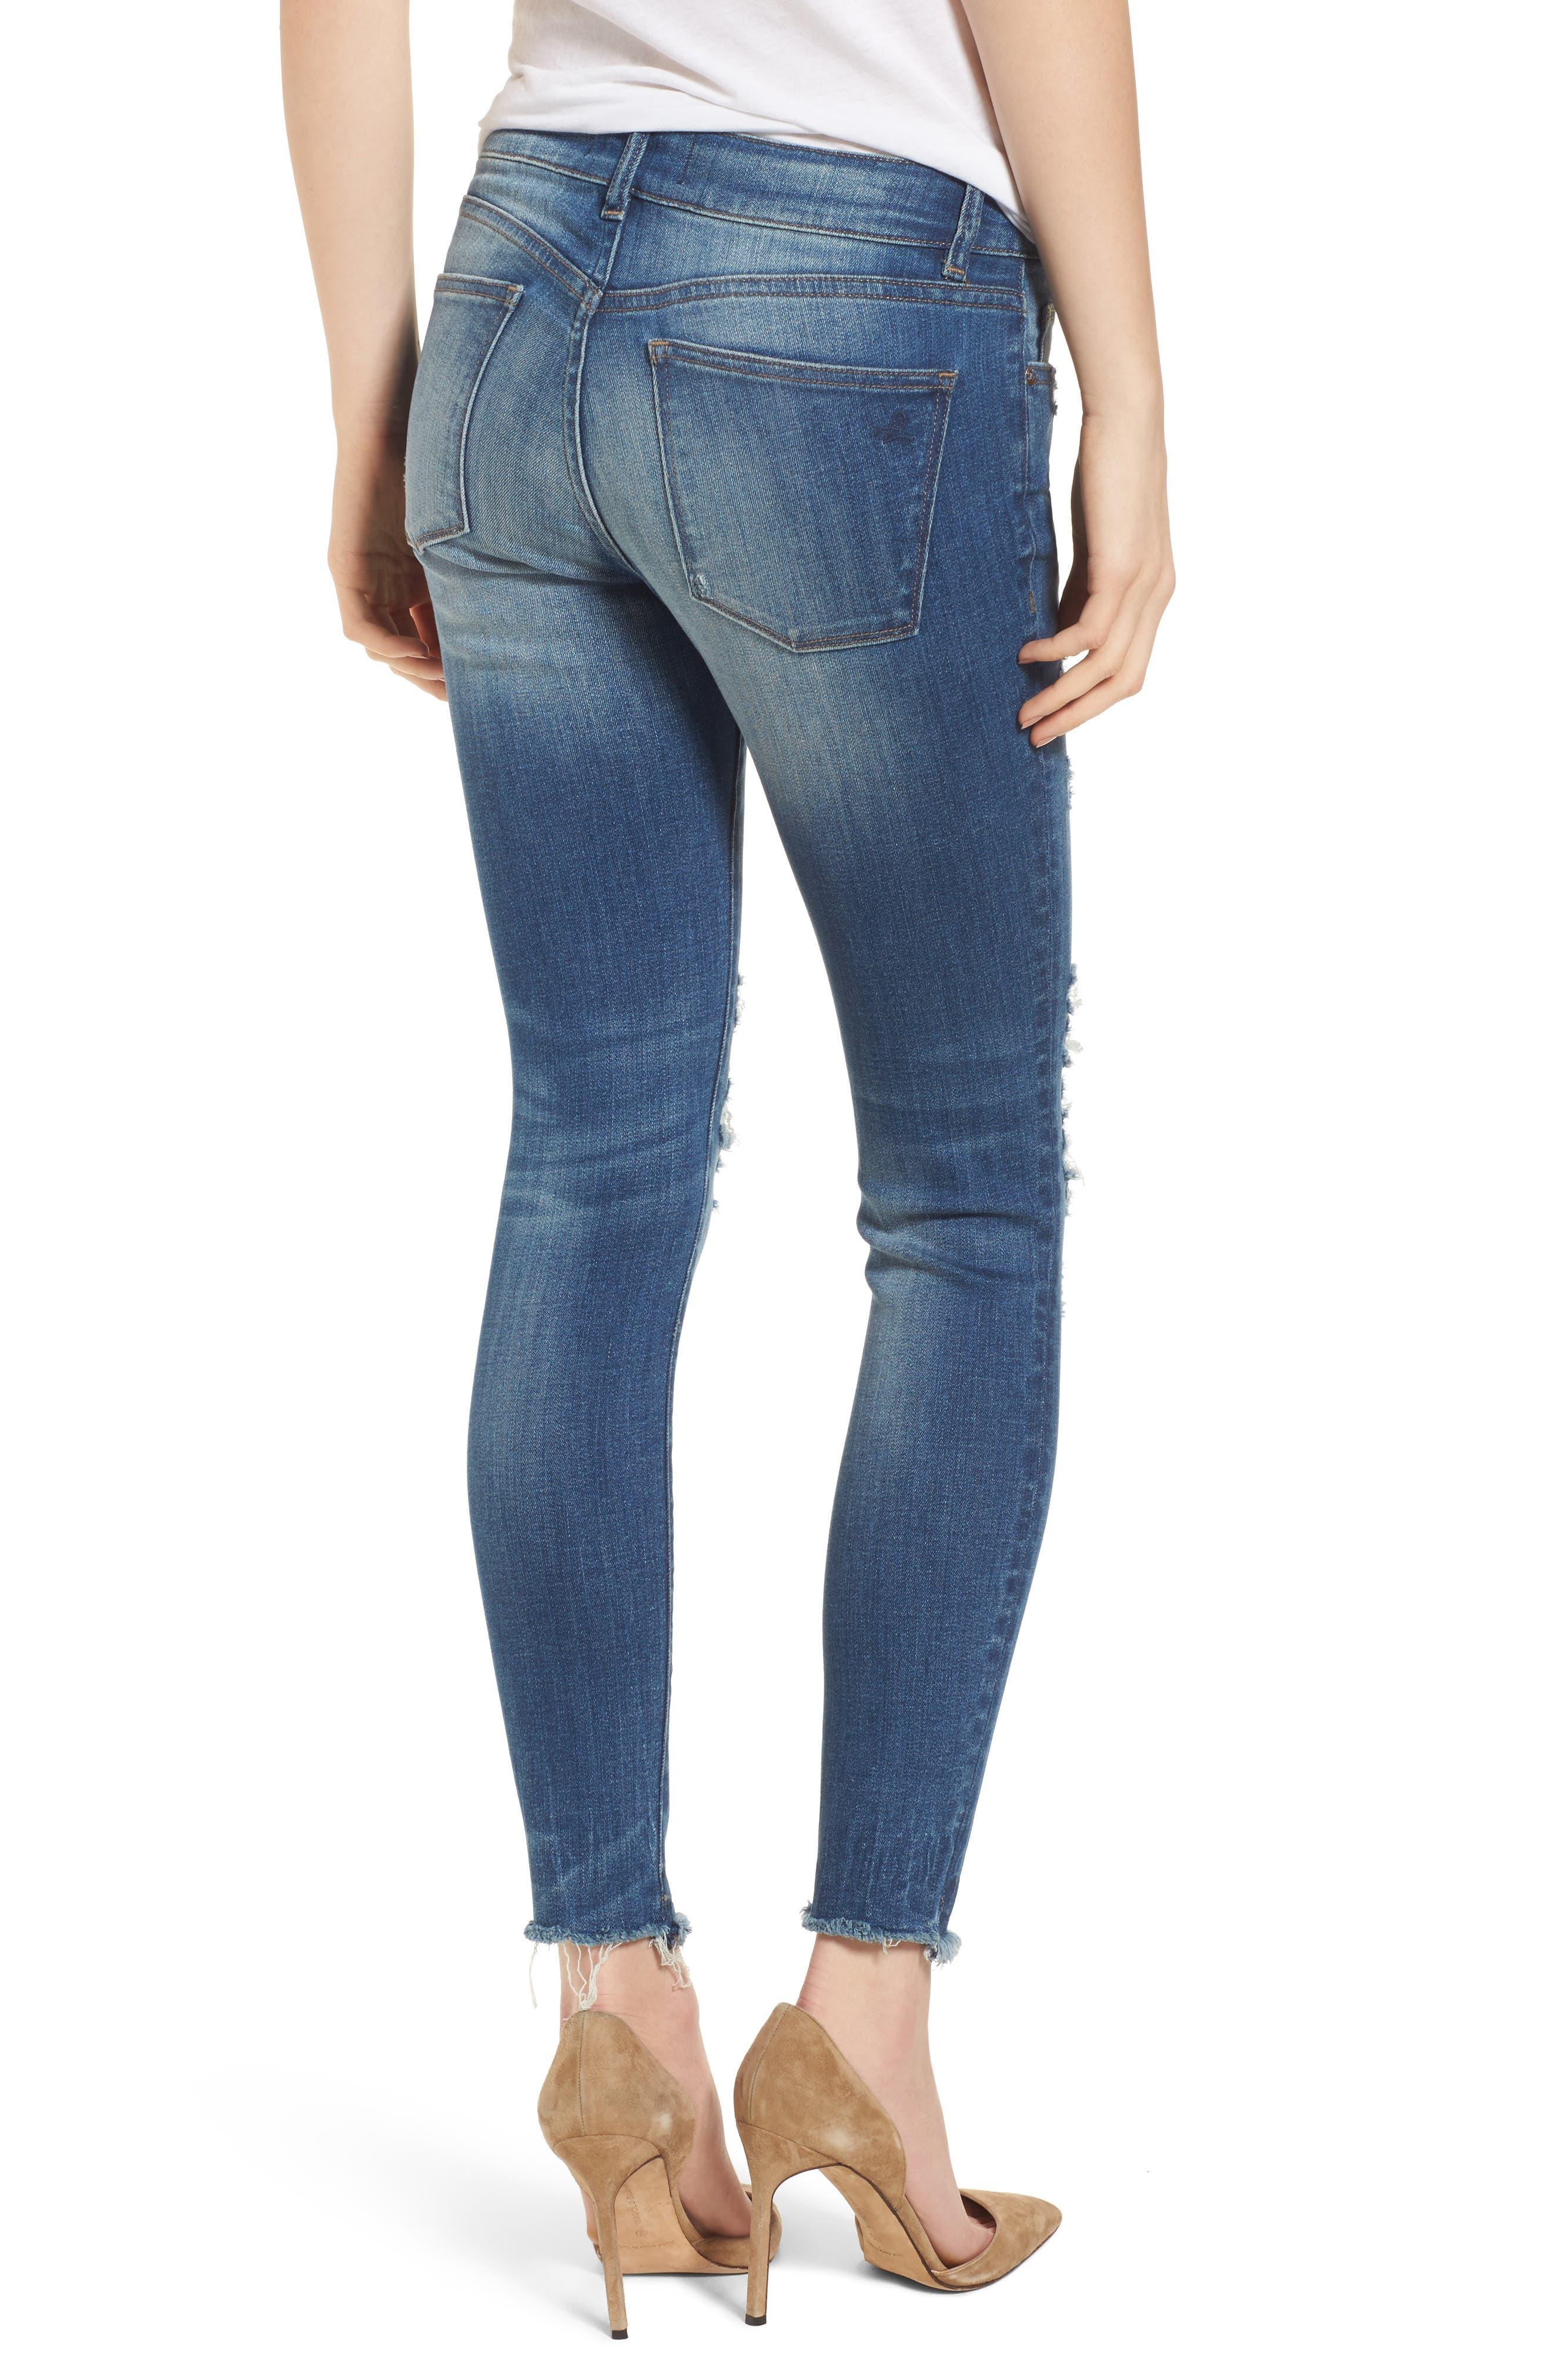 Emma Power Legging Jeans,                             Alternate thumbnail 2, color,                             Westwood